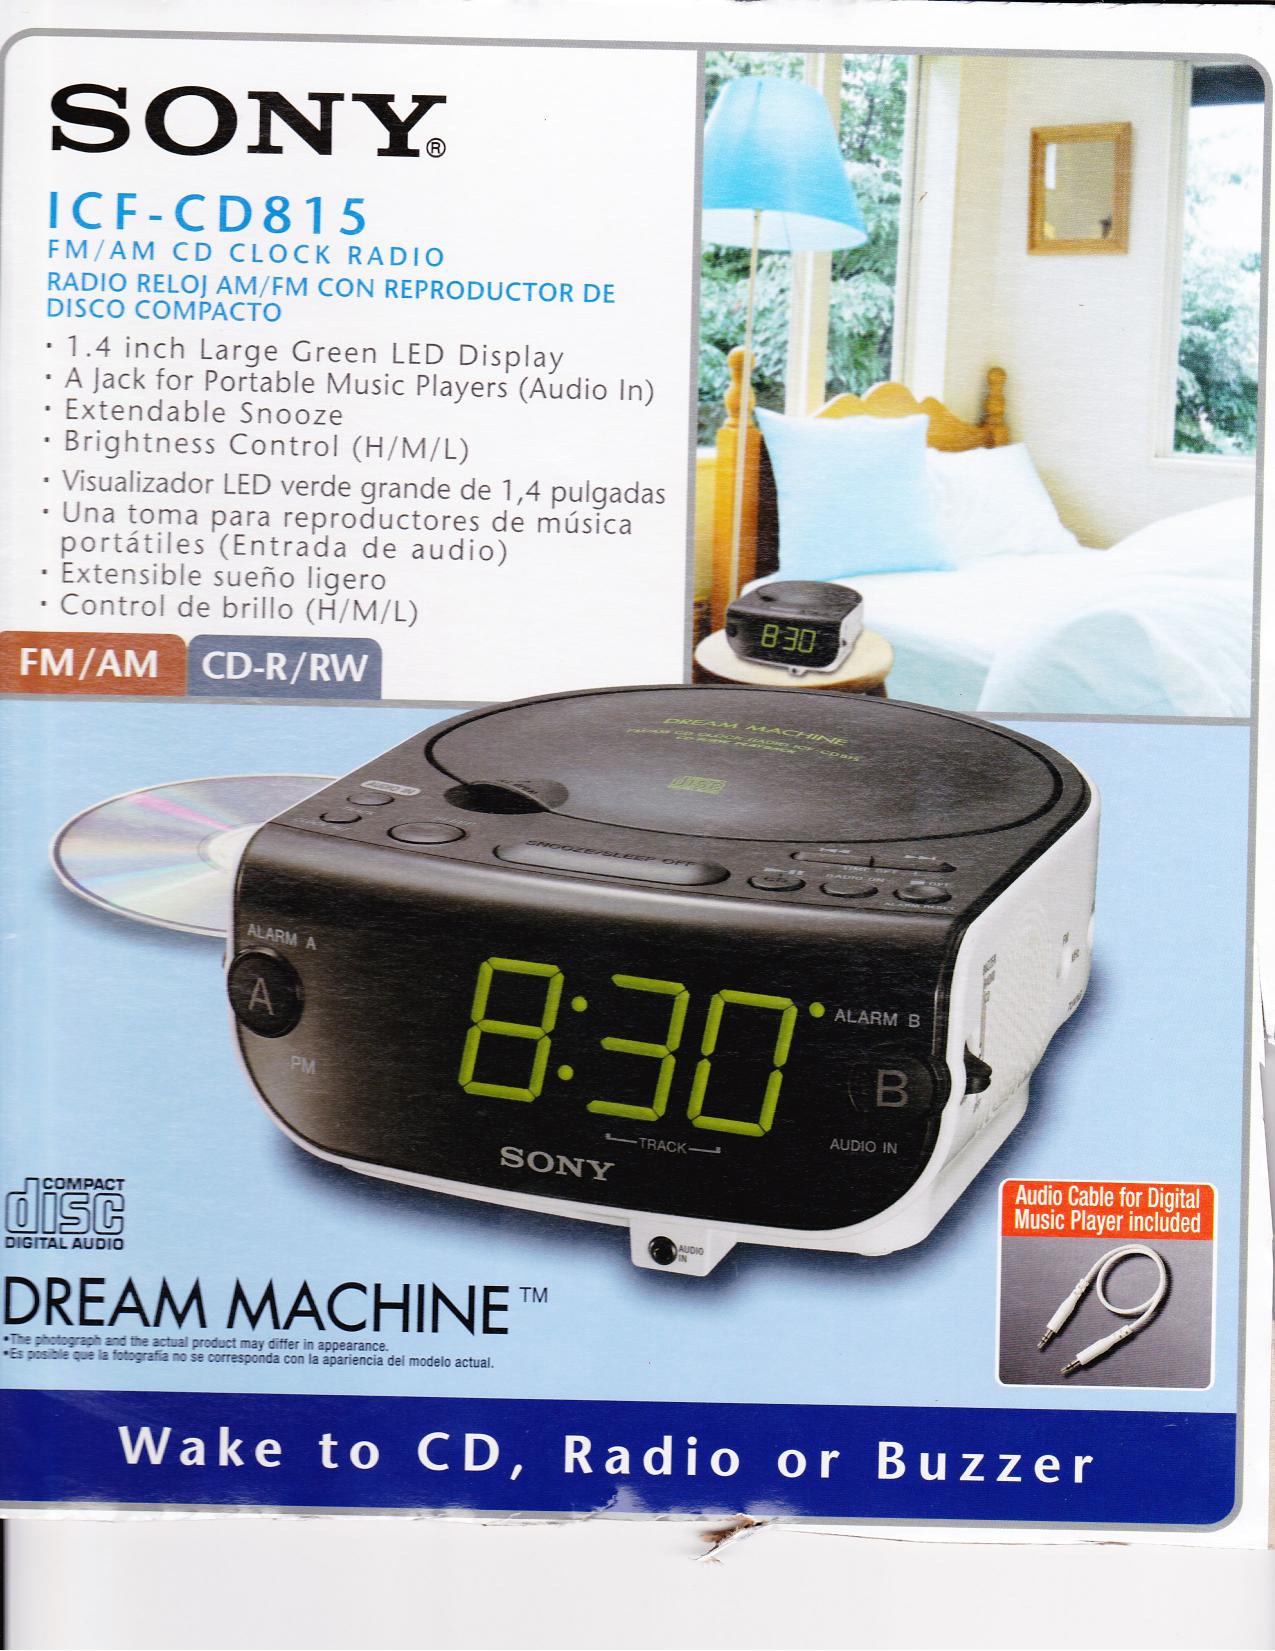 Sony Dream Machine Alarm Clock Icf Cd815 Manual Data Wiring Diagrams